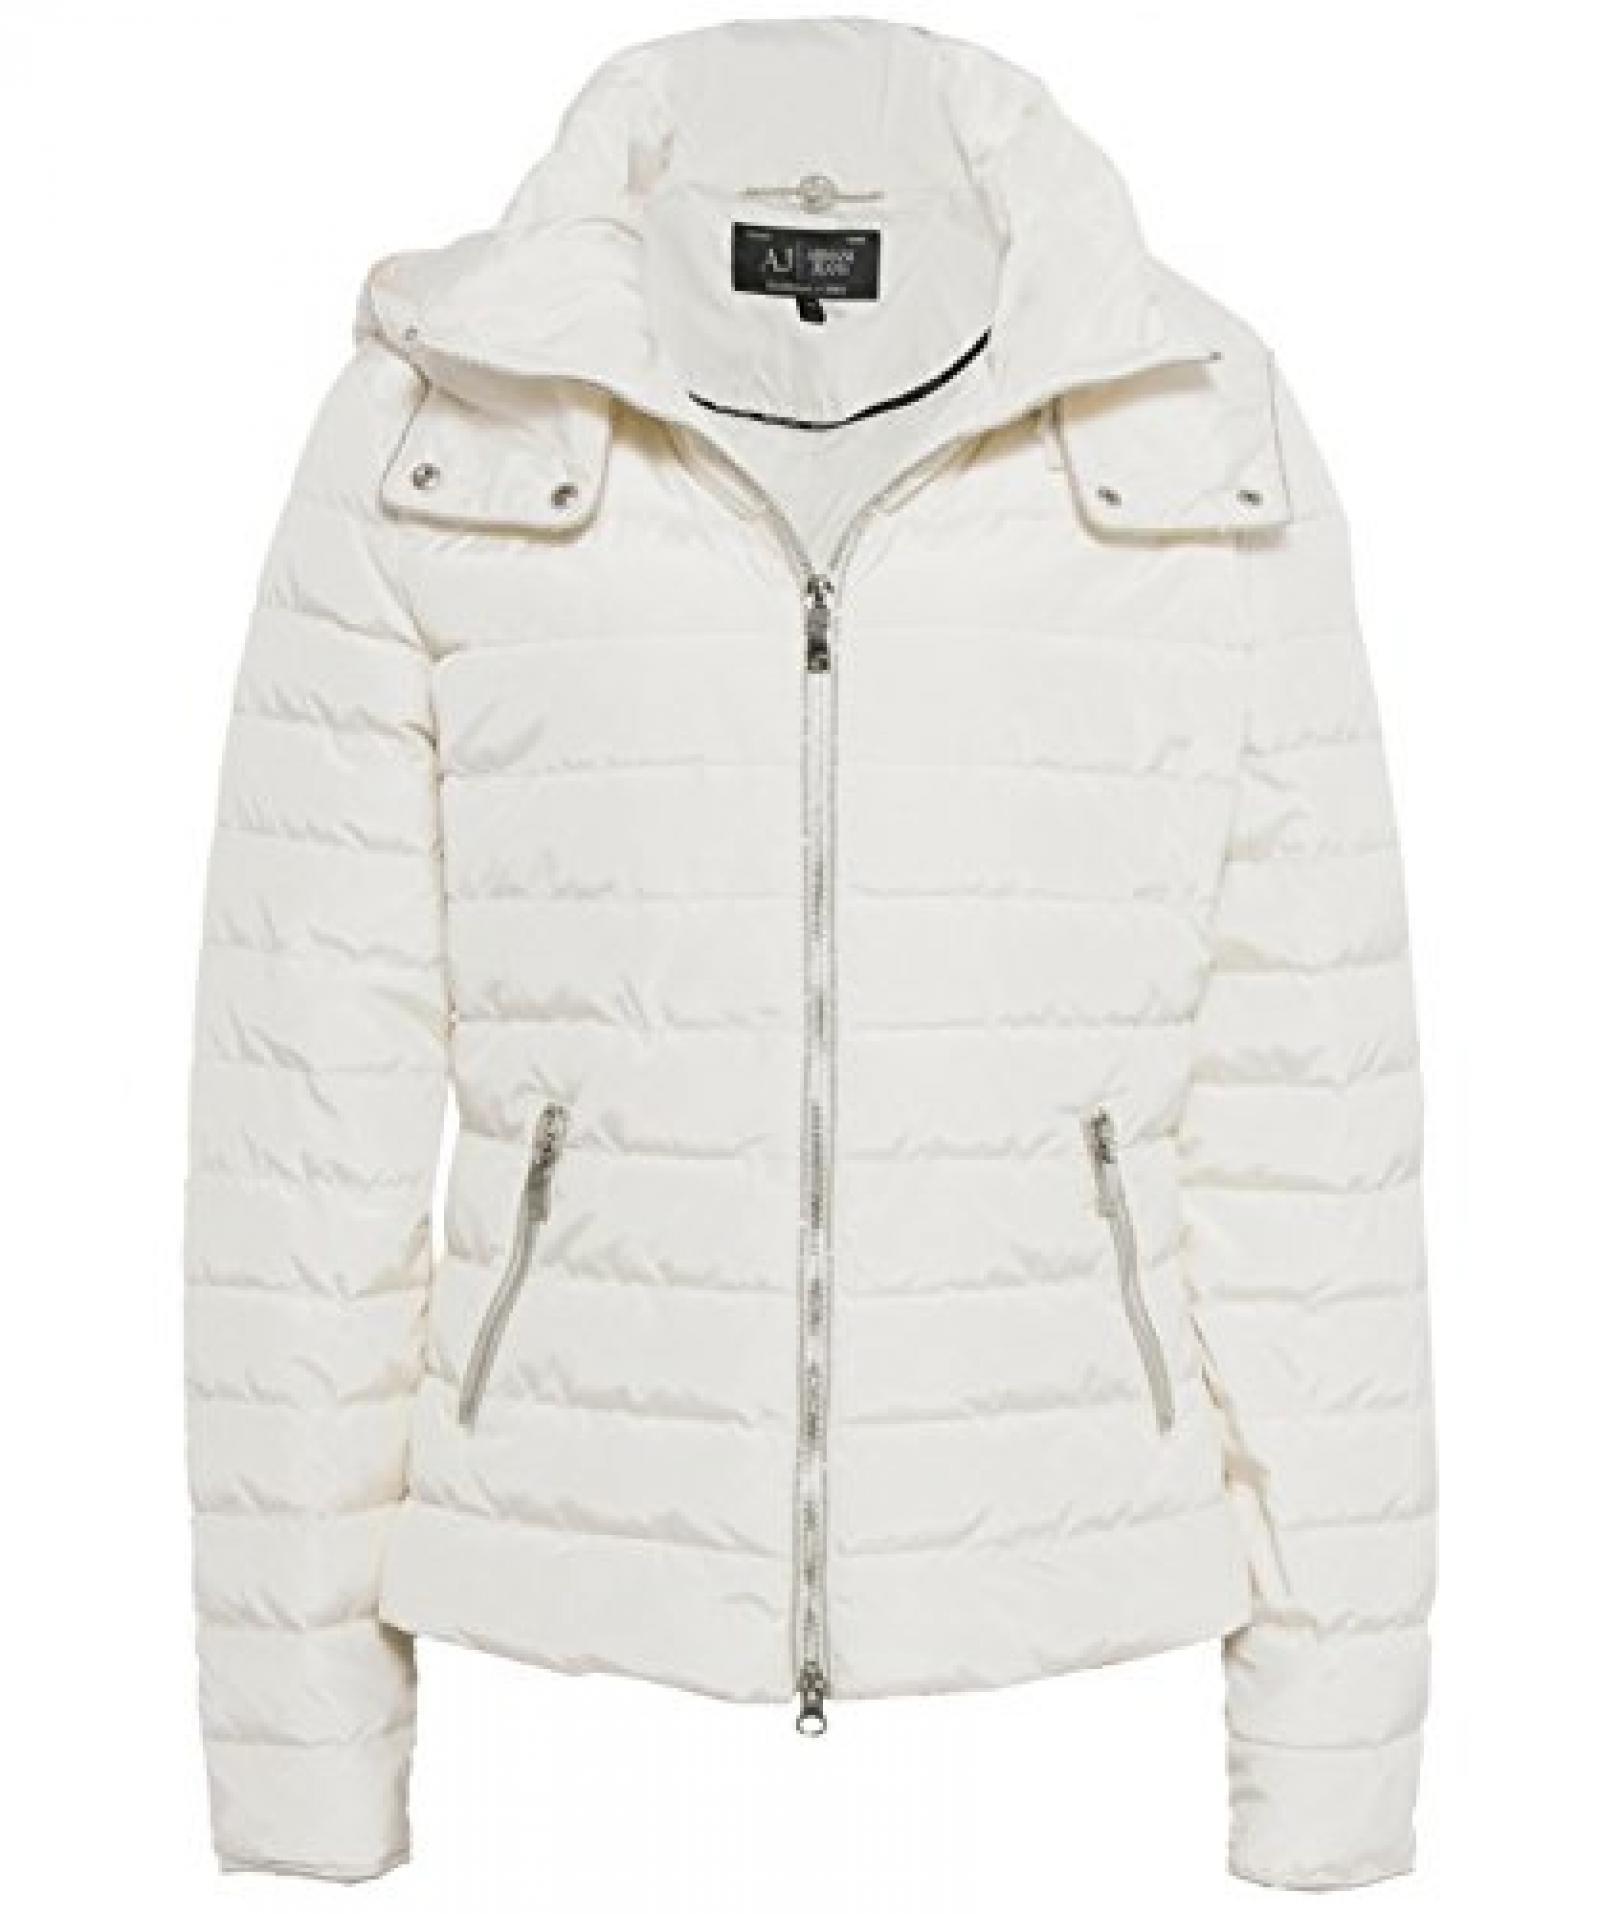 Armani Jeans Hooded Puffa Jacket WEIß